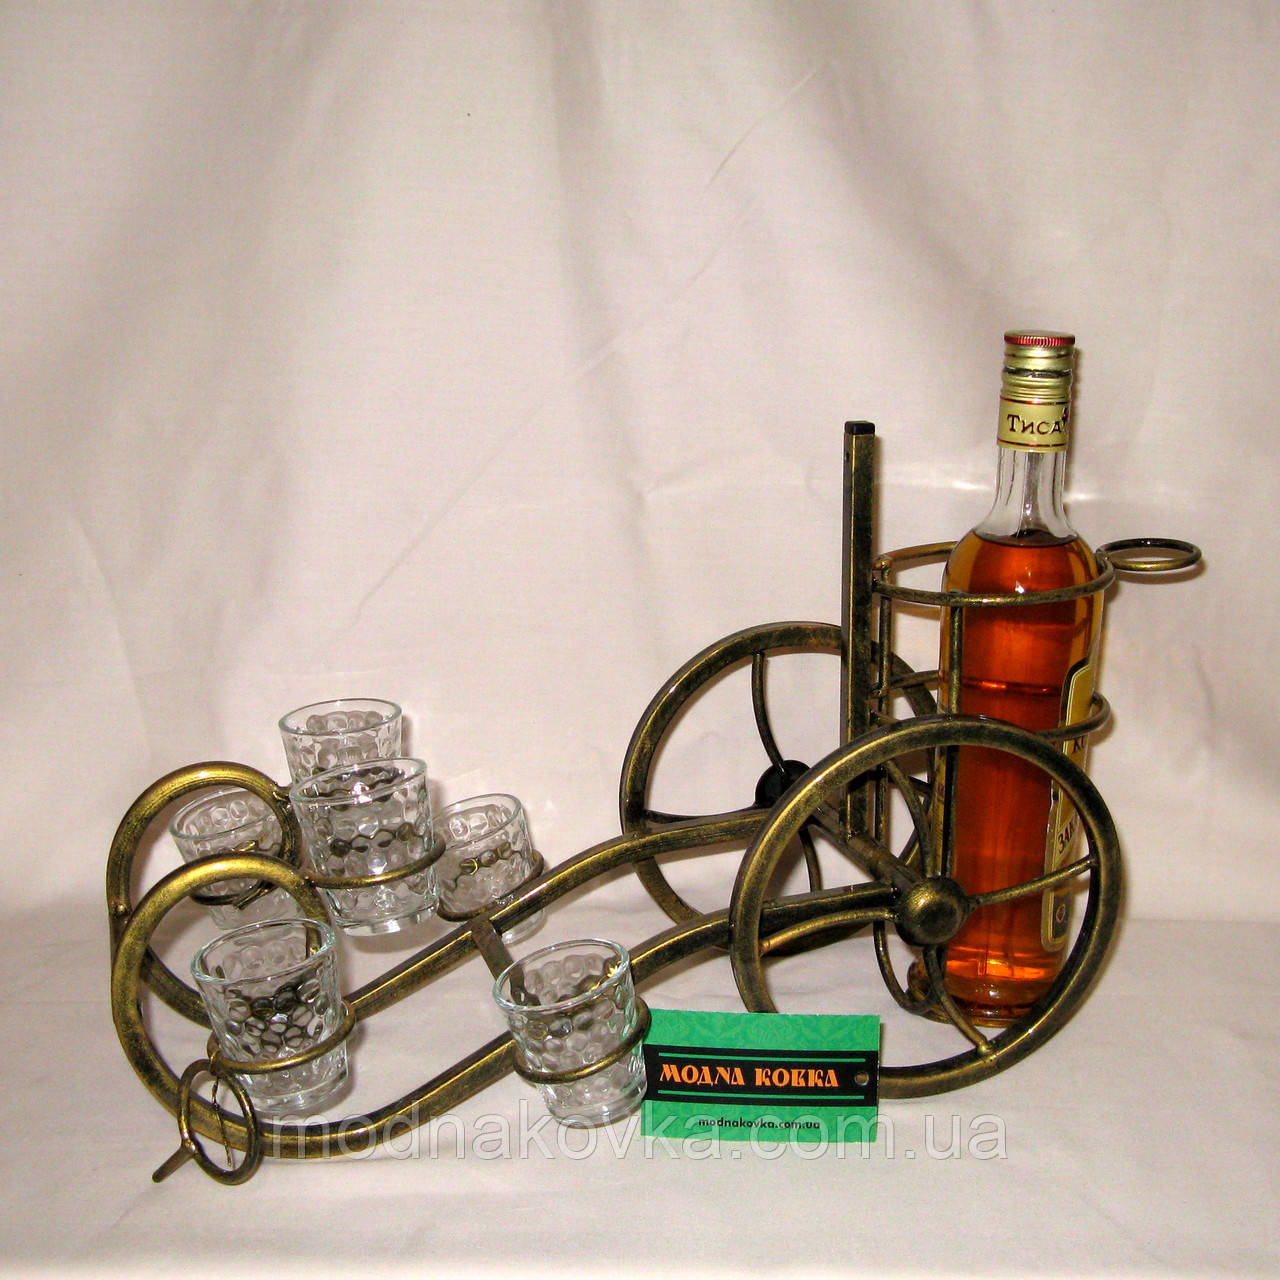 Мини-бар 11 с рюмками кованый (подставка под бутылку)  Пушка